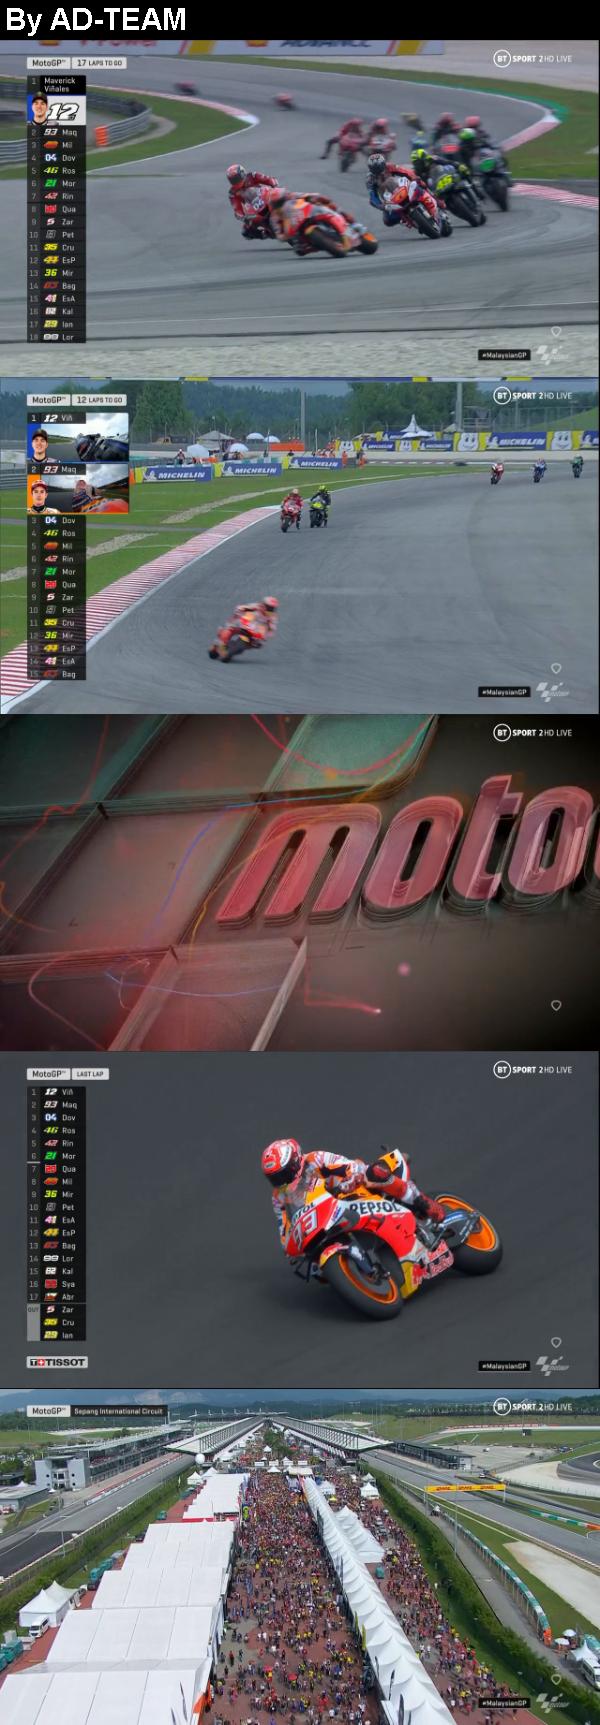 MotoGP 2019 Malaysia 720p HDTV x264-ACES